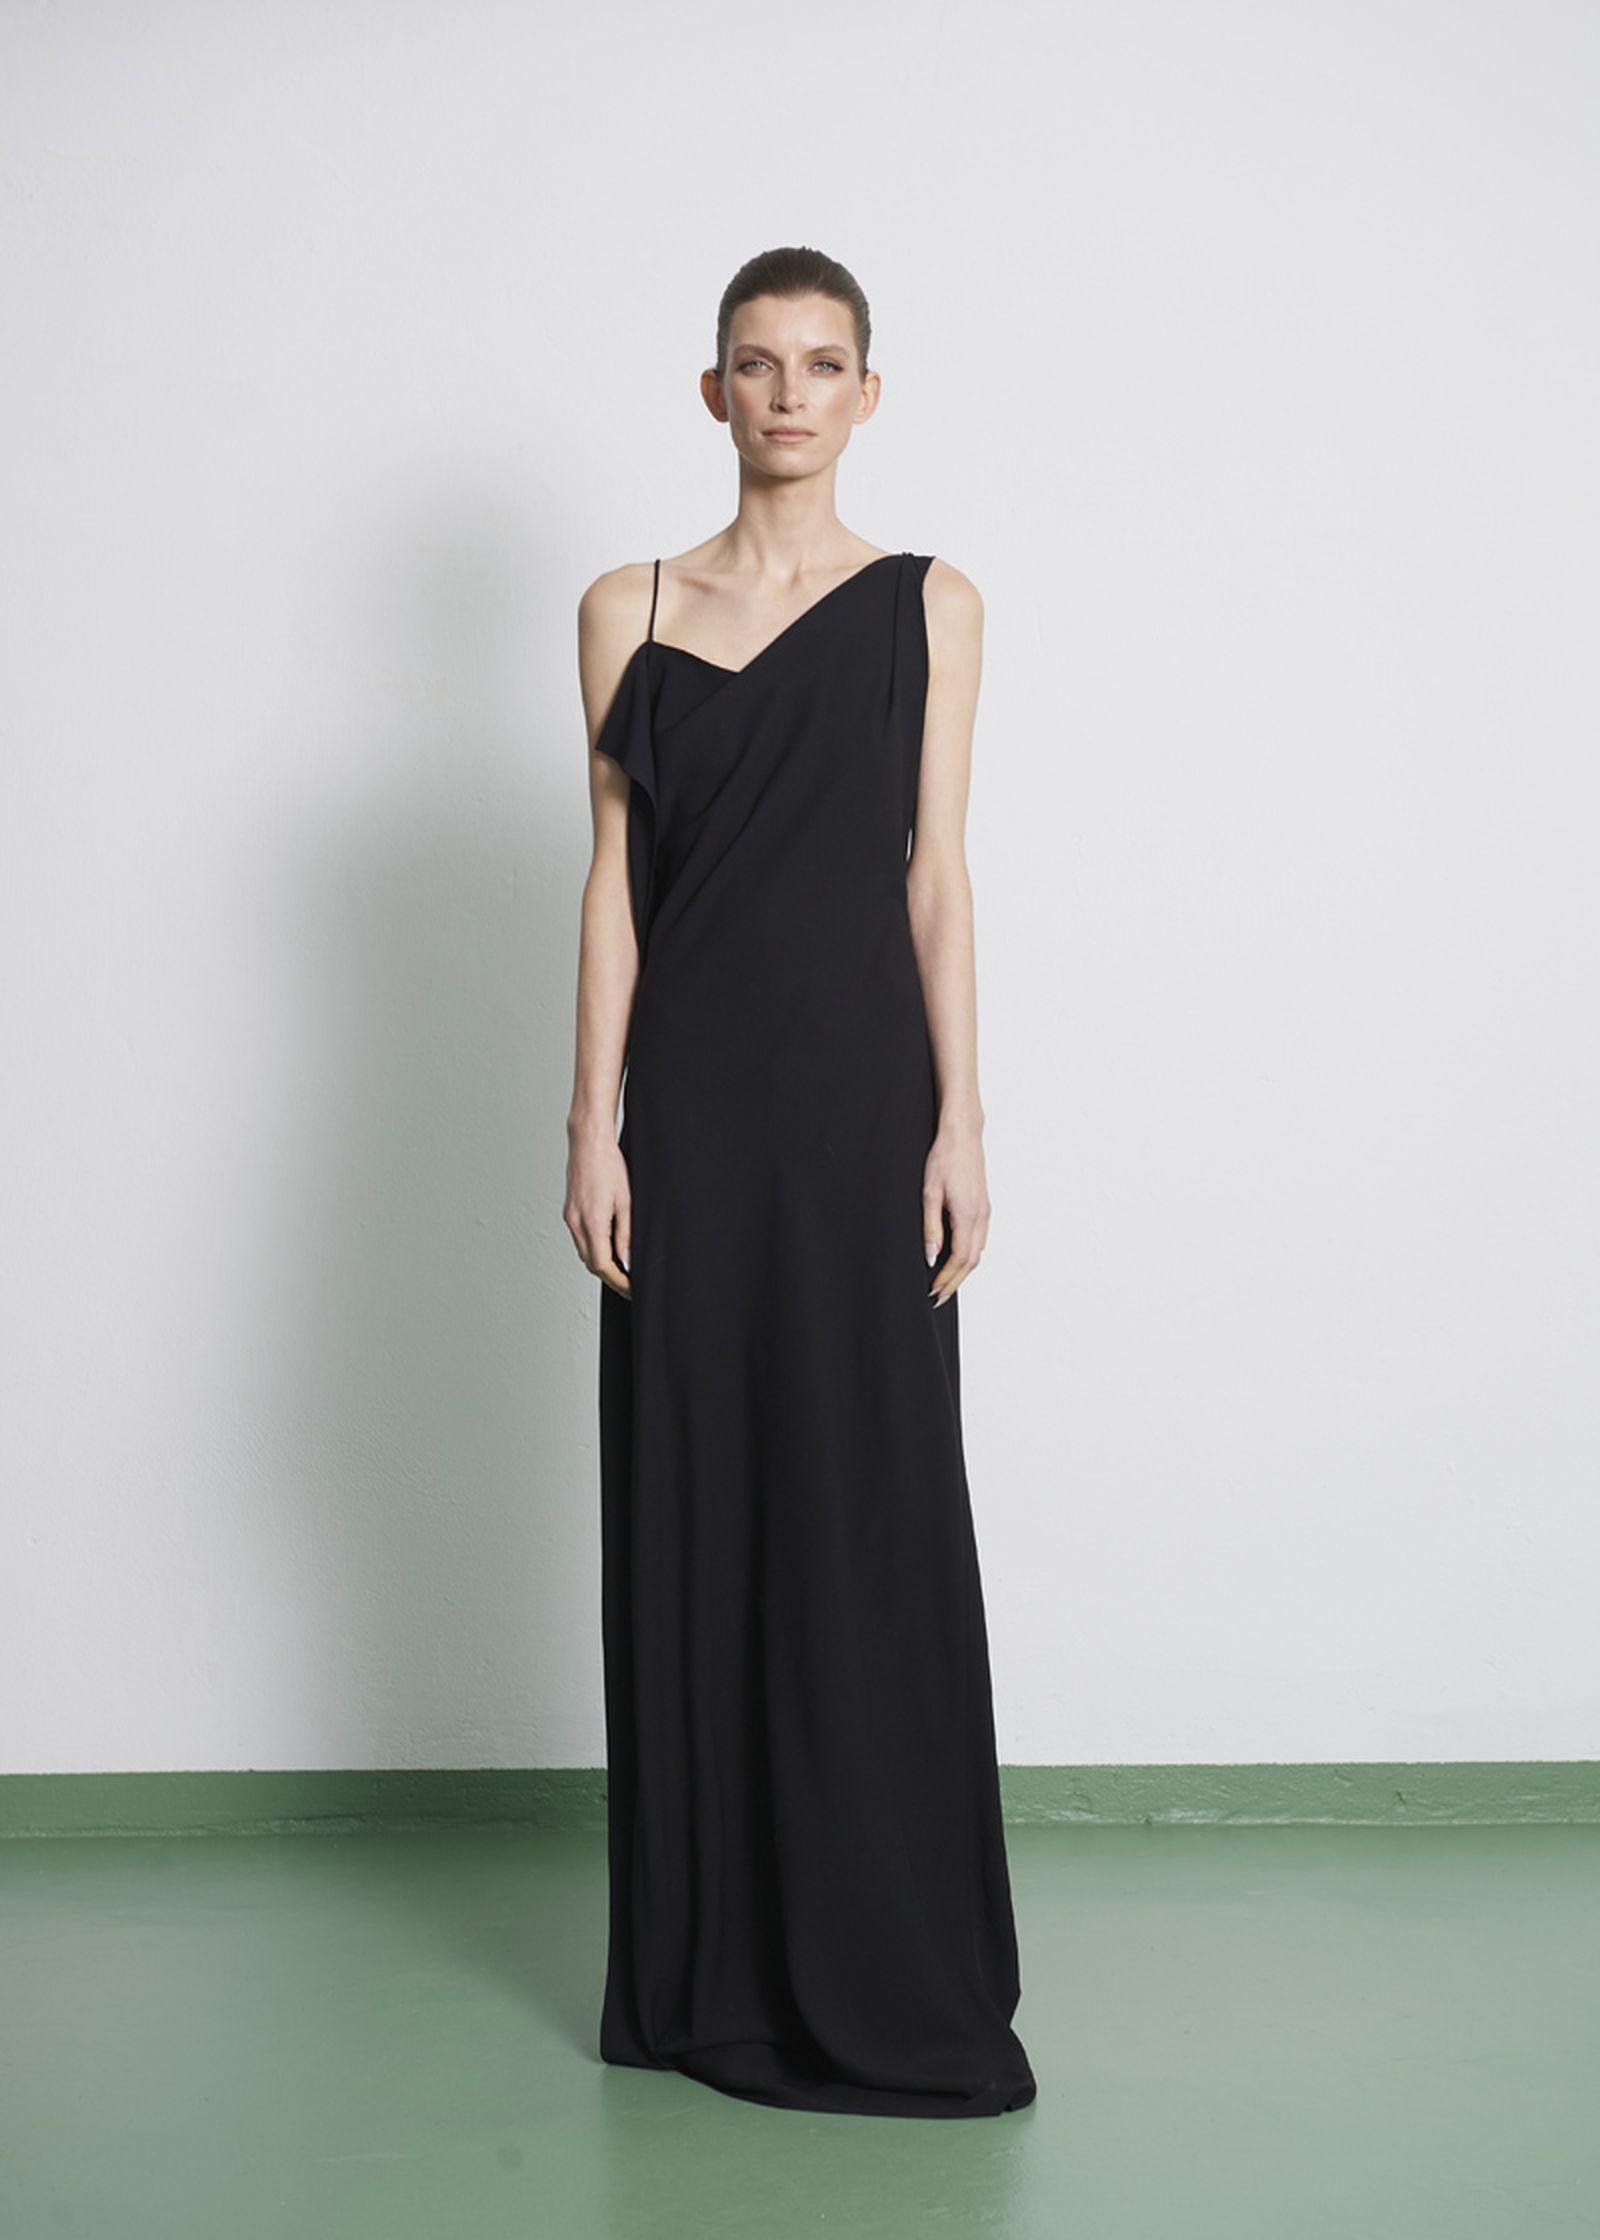 032c-rtw-womenswear-collection-paris-11